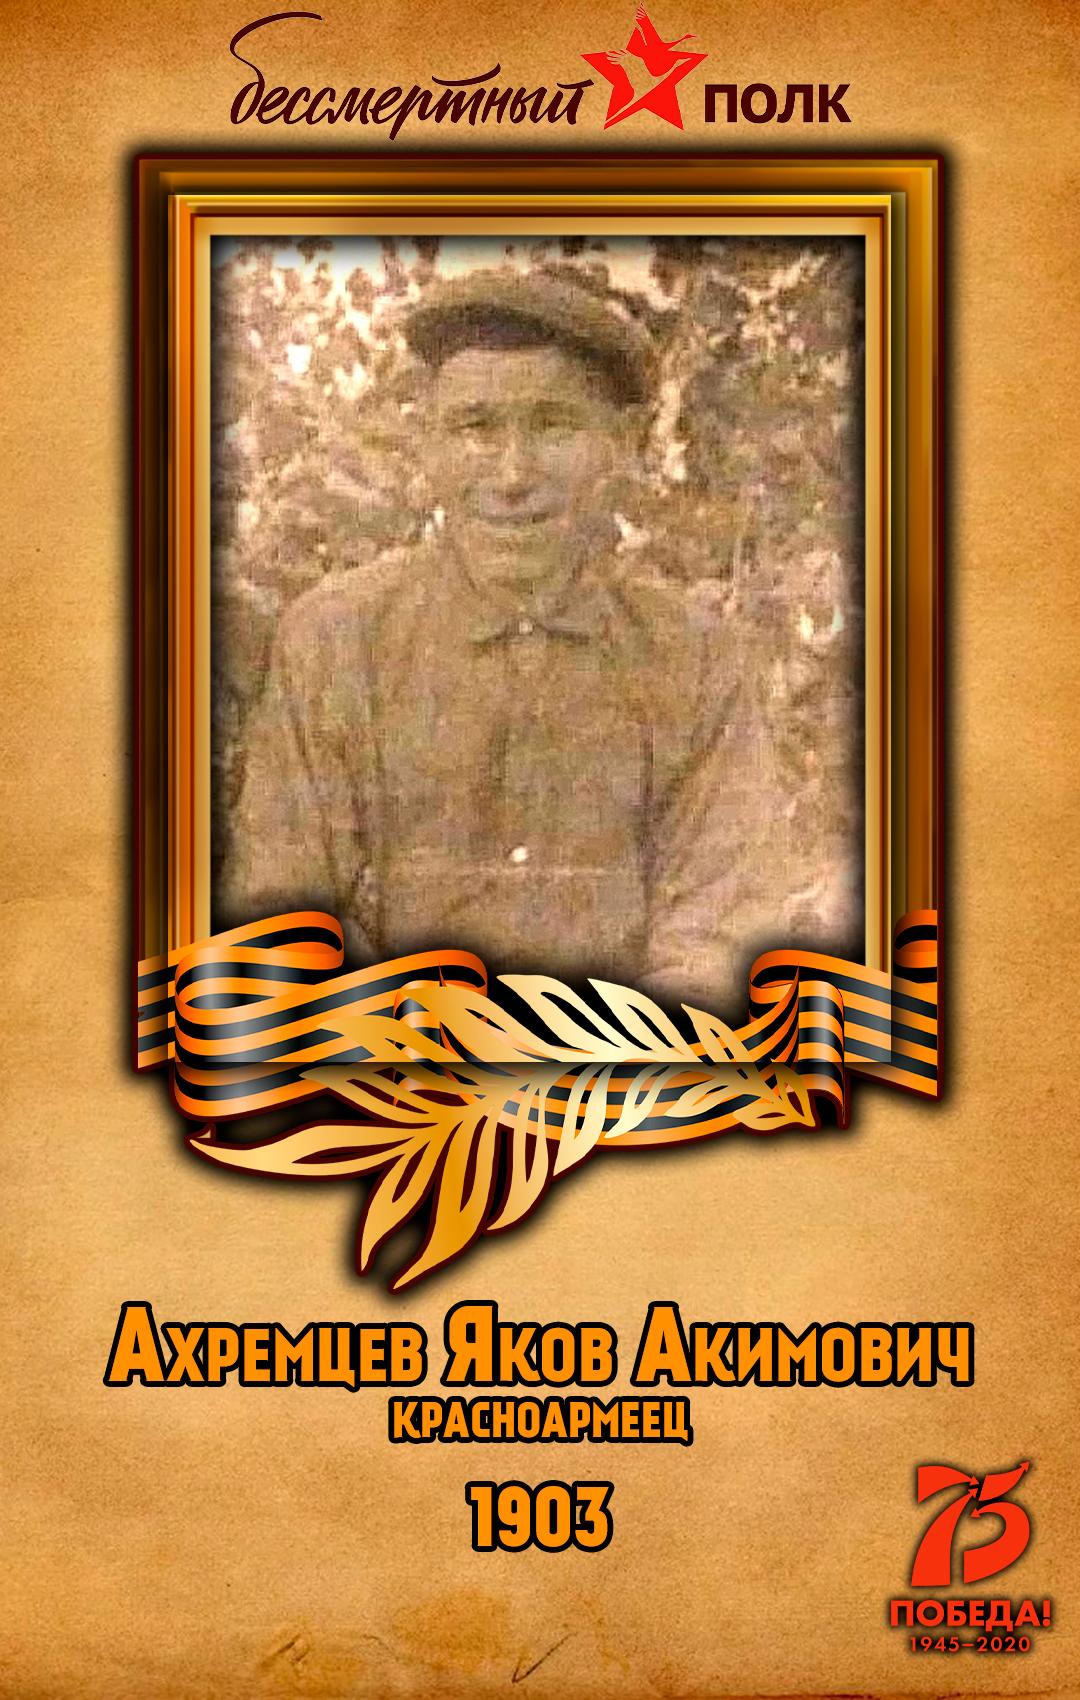 Ахремцев-Яков-Акимович